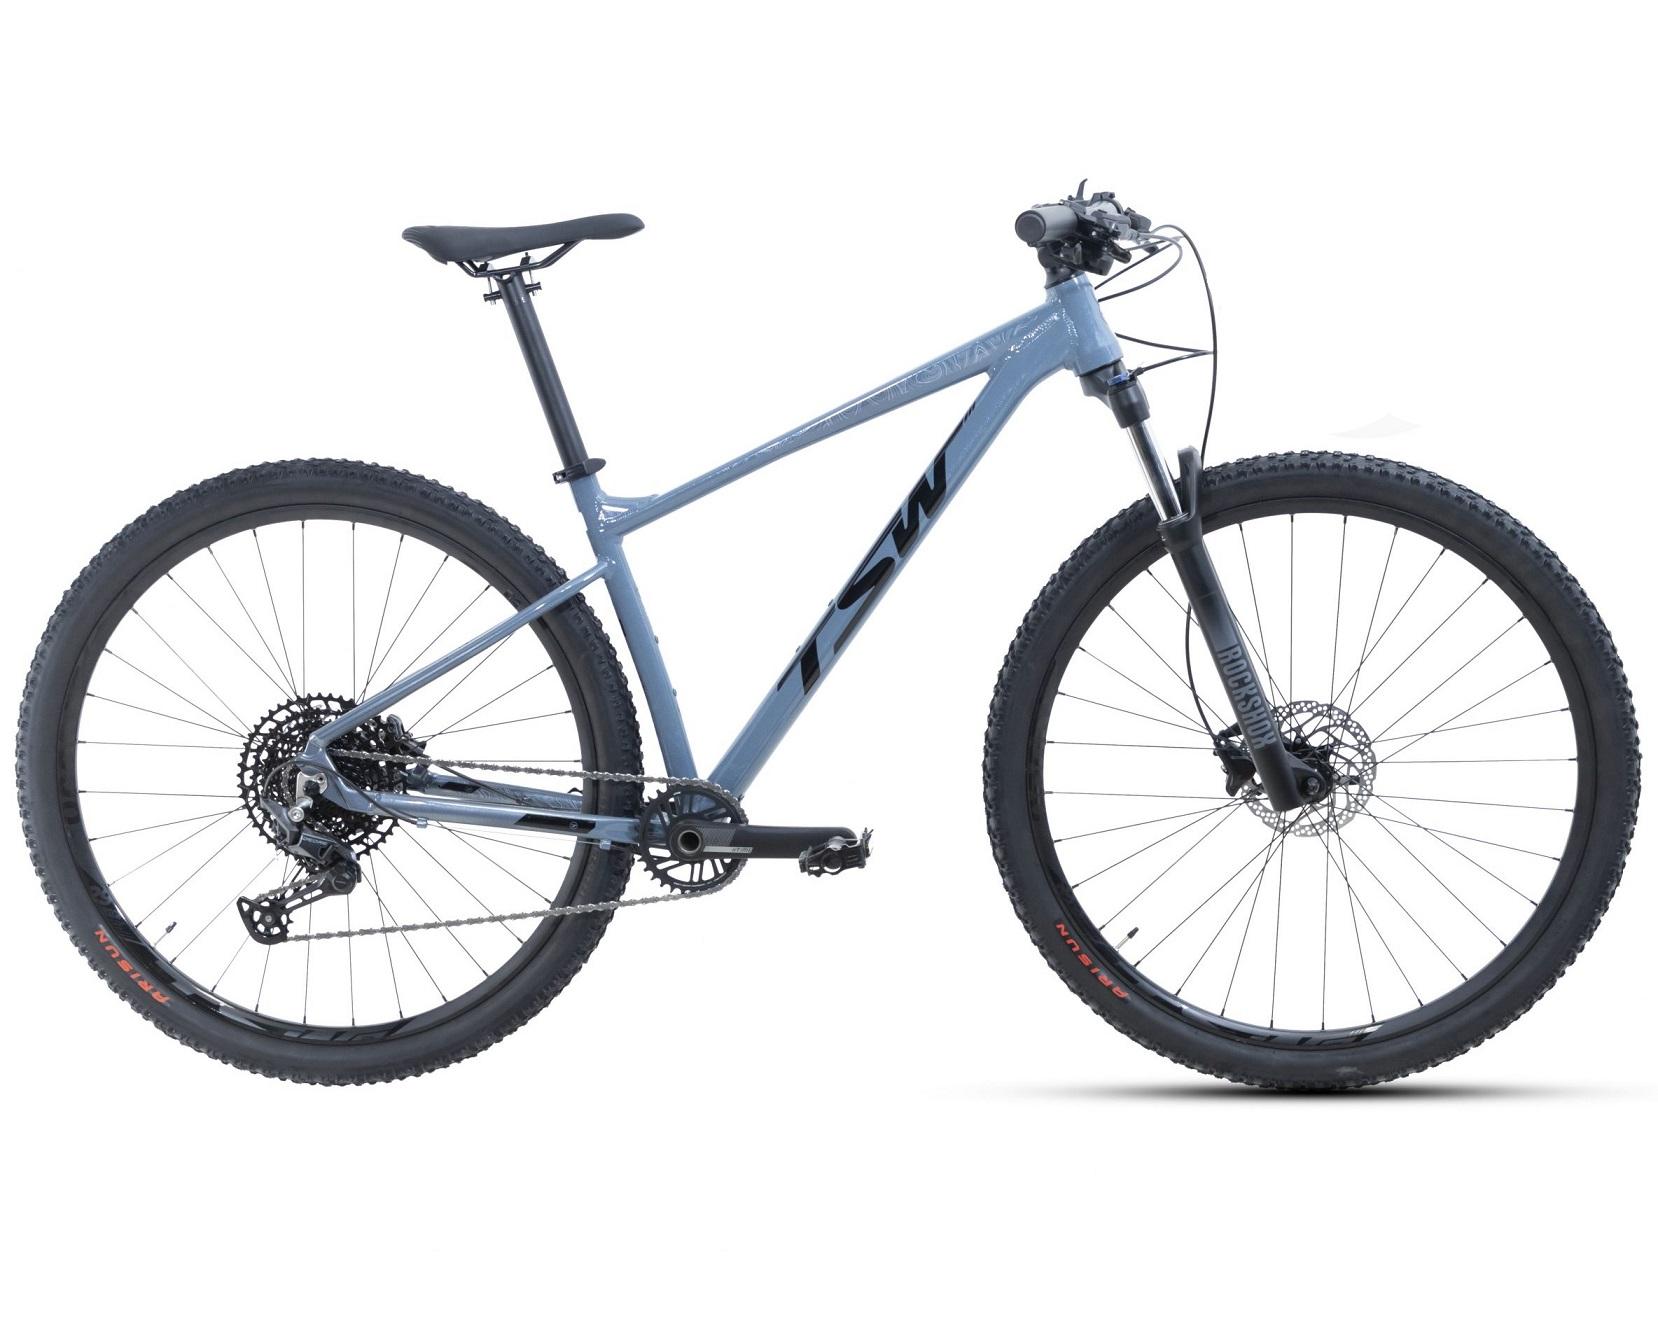 BICICLETA 29 TSW HURRY DEORE/X-TIME 1X12 VEL CINZA/AZUL(2021)